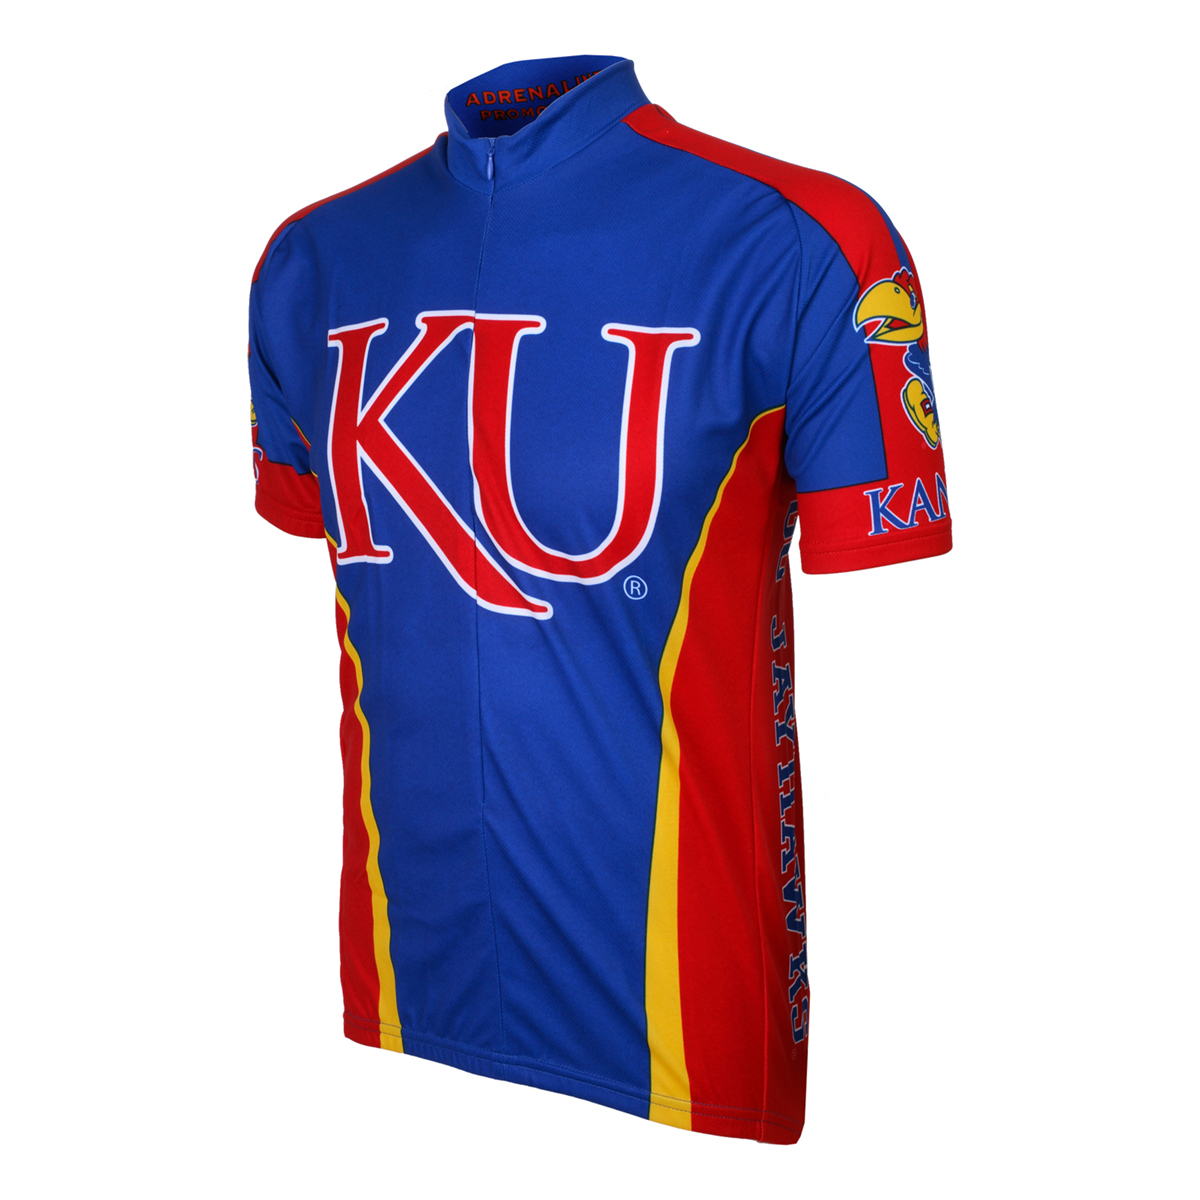 Adrenaline Promotions Kansas University Jayhawks Cycling Jersey